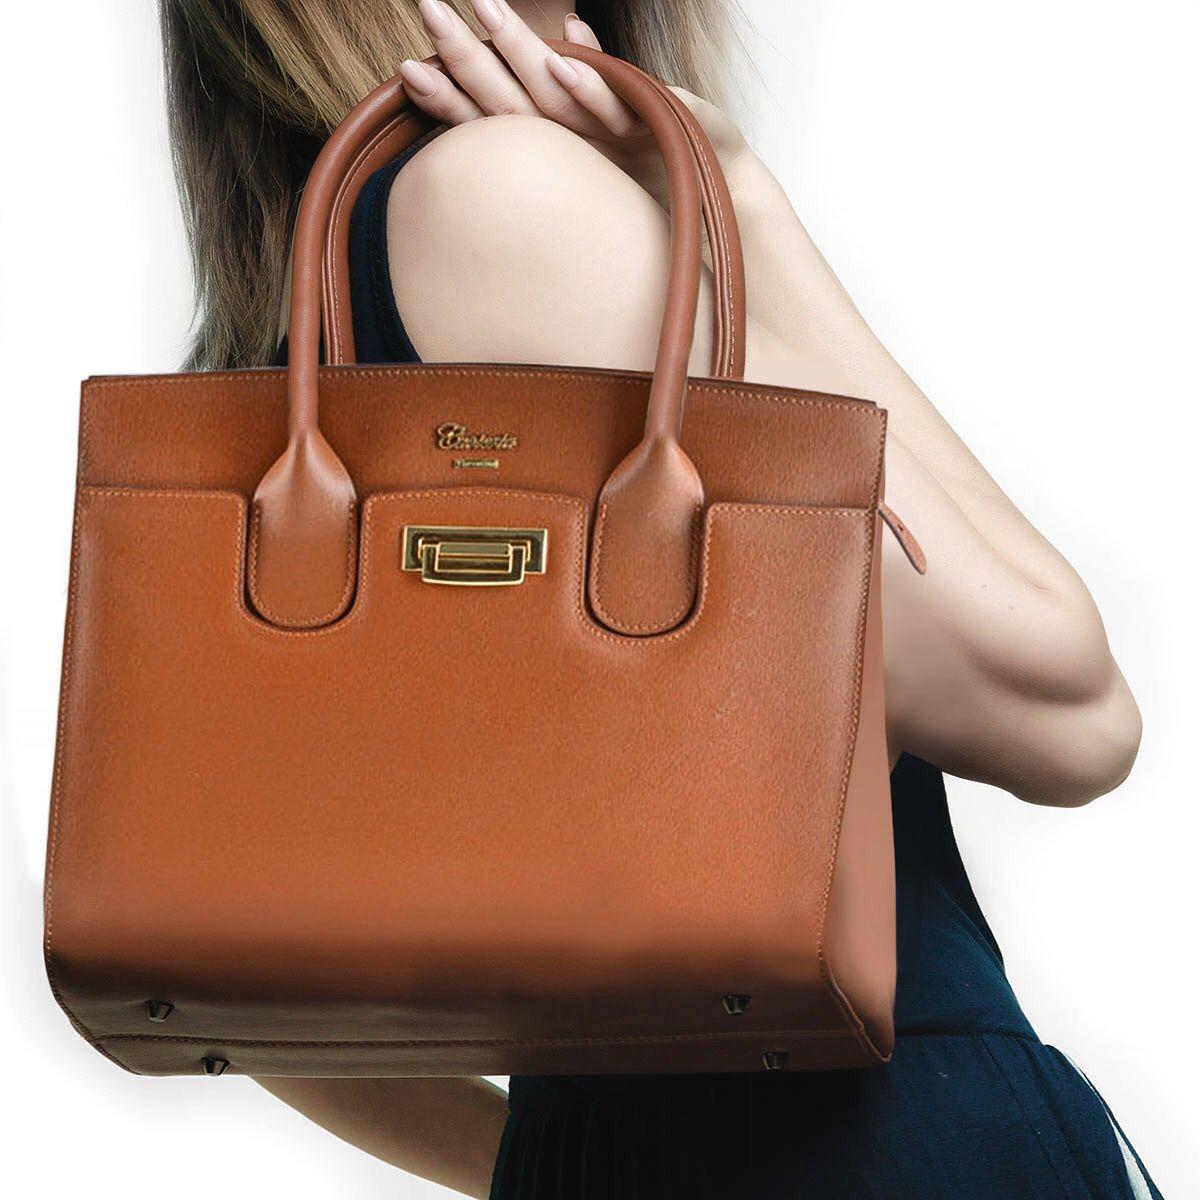 leather handbags online